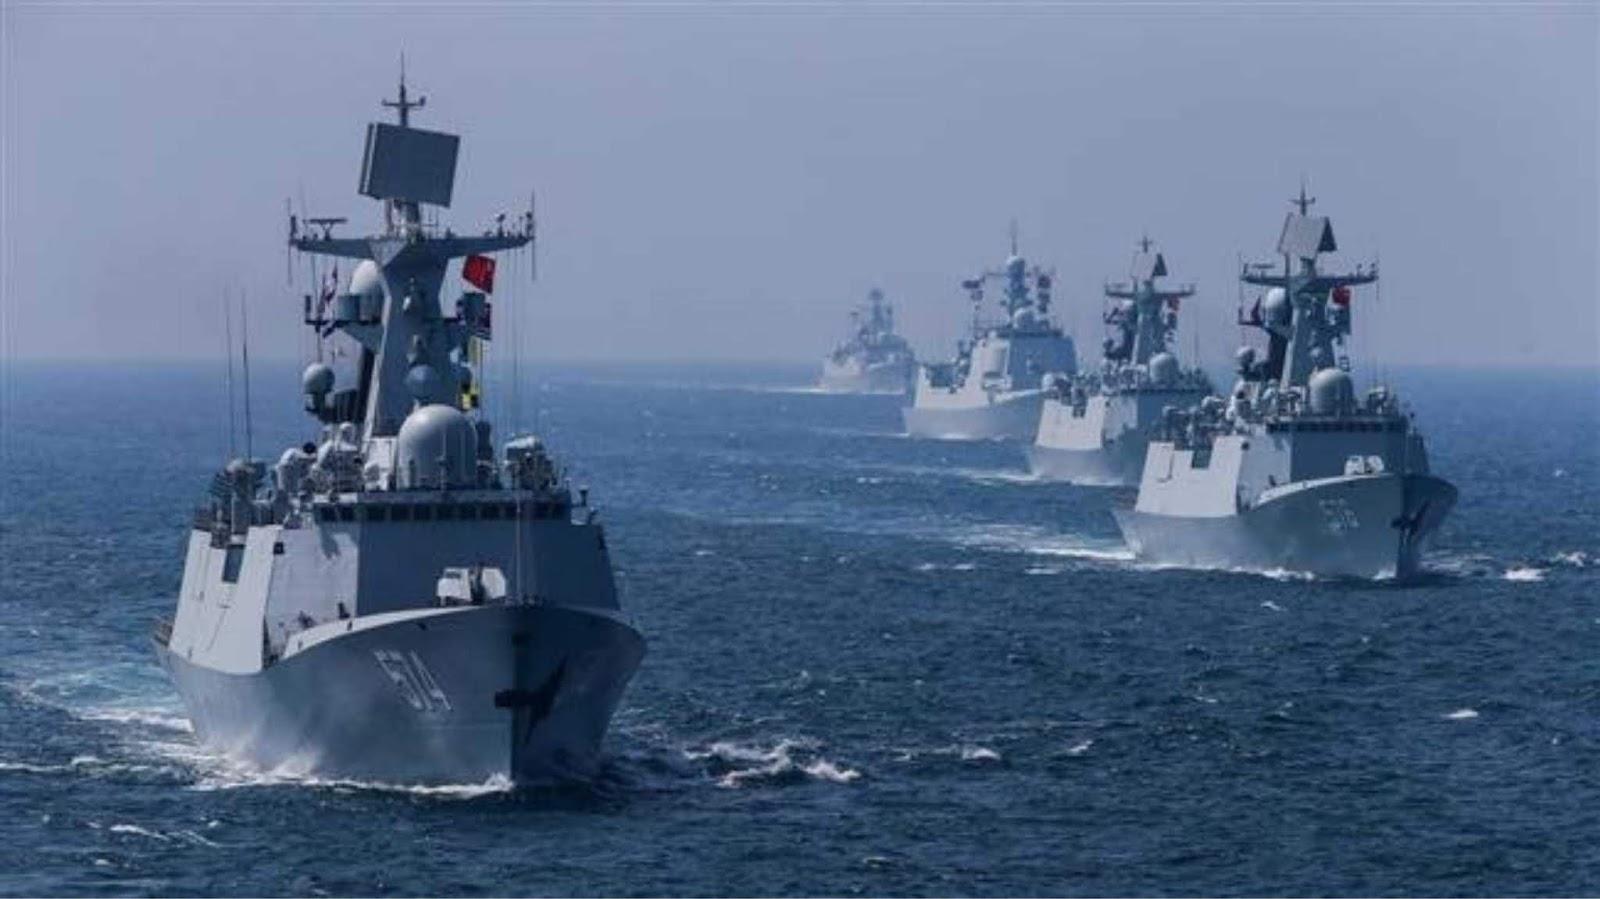 Cina dan negara-negara ASEAN memulai latihan maritim bersama perdana